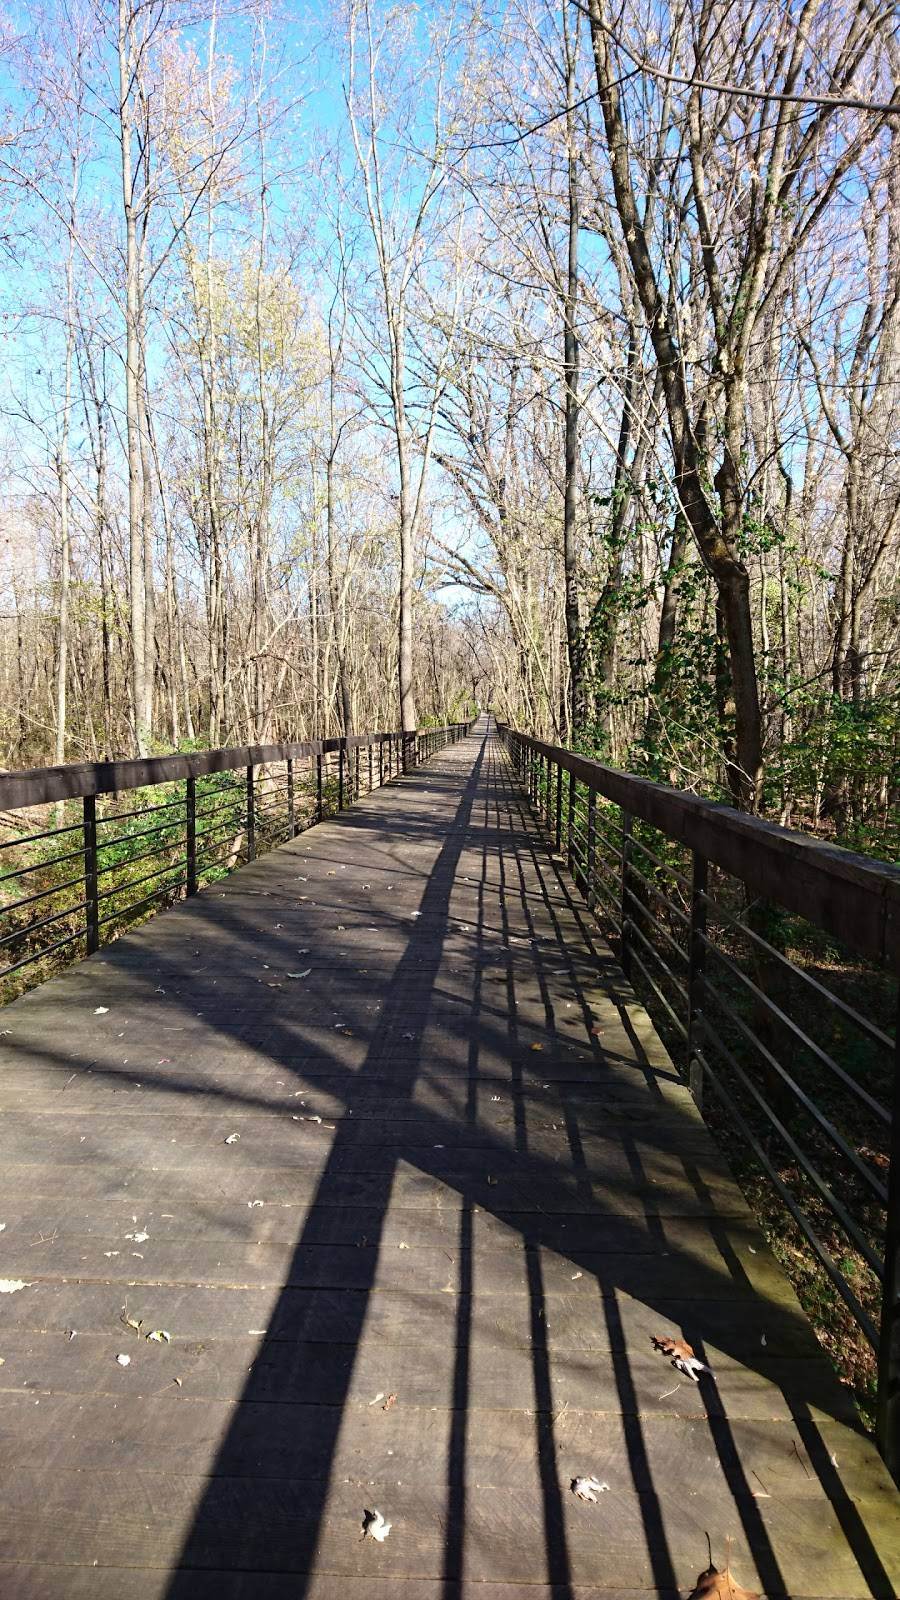 Mock Park - park  | Photo 3 of 10 | Address: 2520 Mock Rd, Columbus, OH 43219, USA | Phone: (614) 645-3300